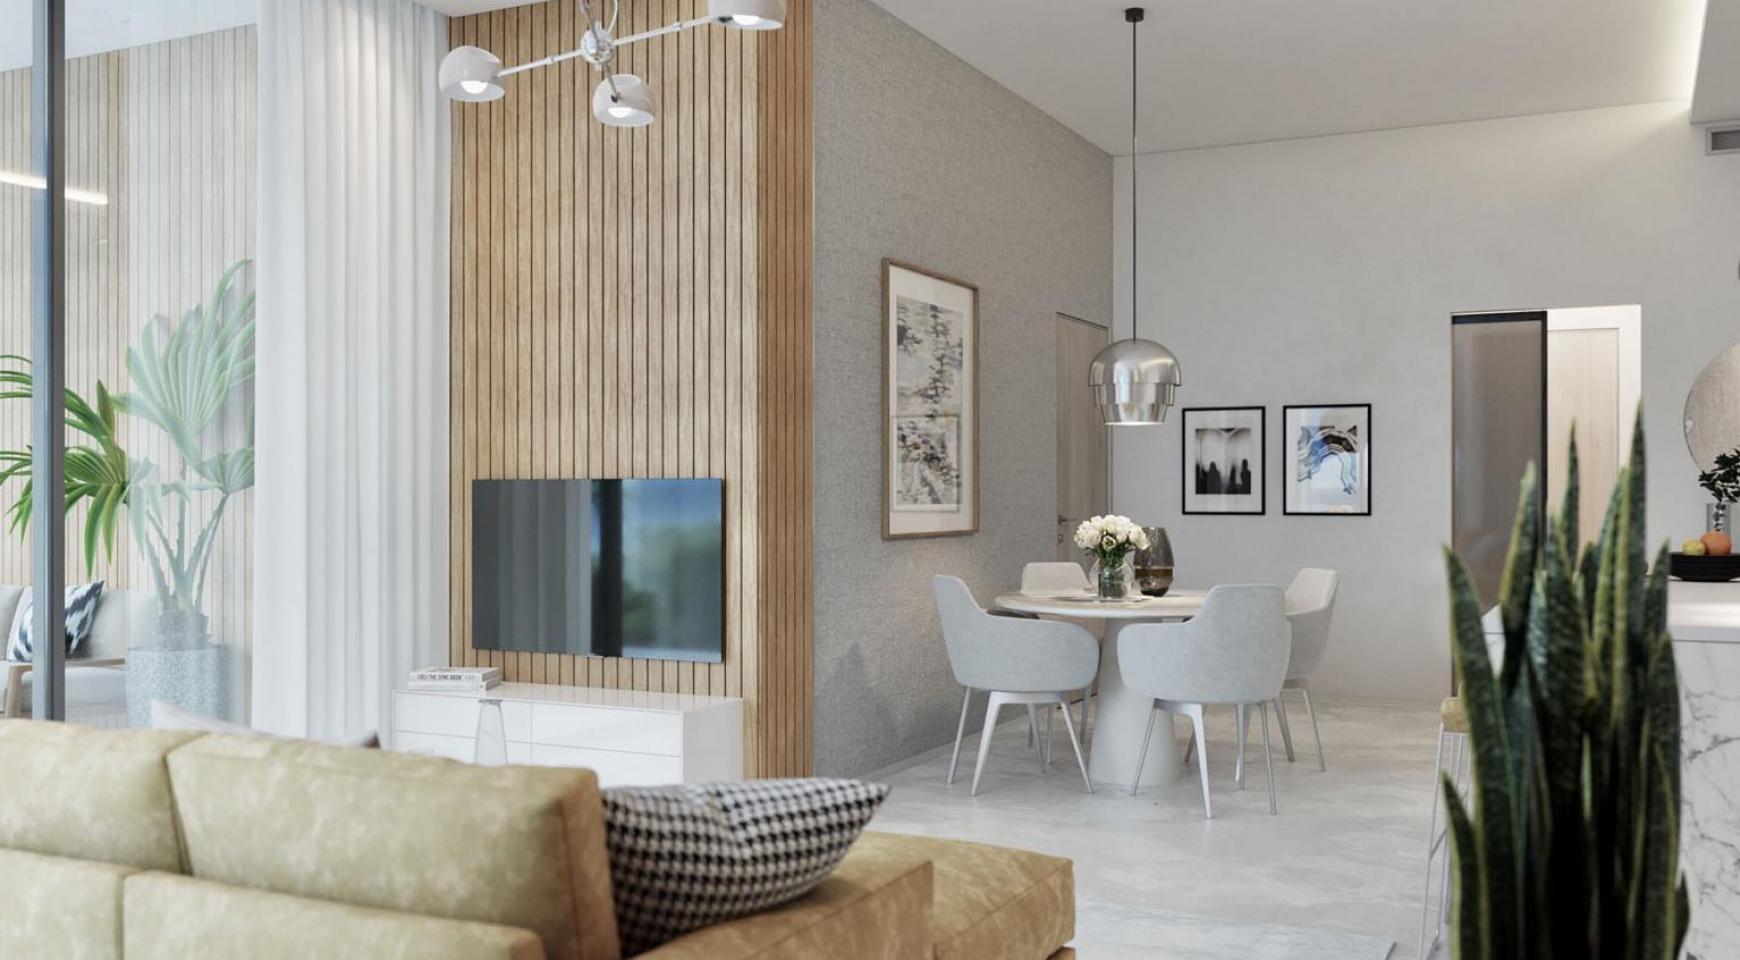 Contemporary 2 Bedroom Apartment in a New Complex near the Sea - 2